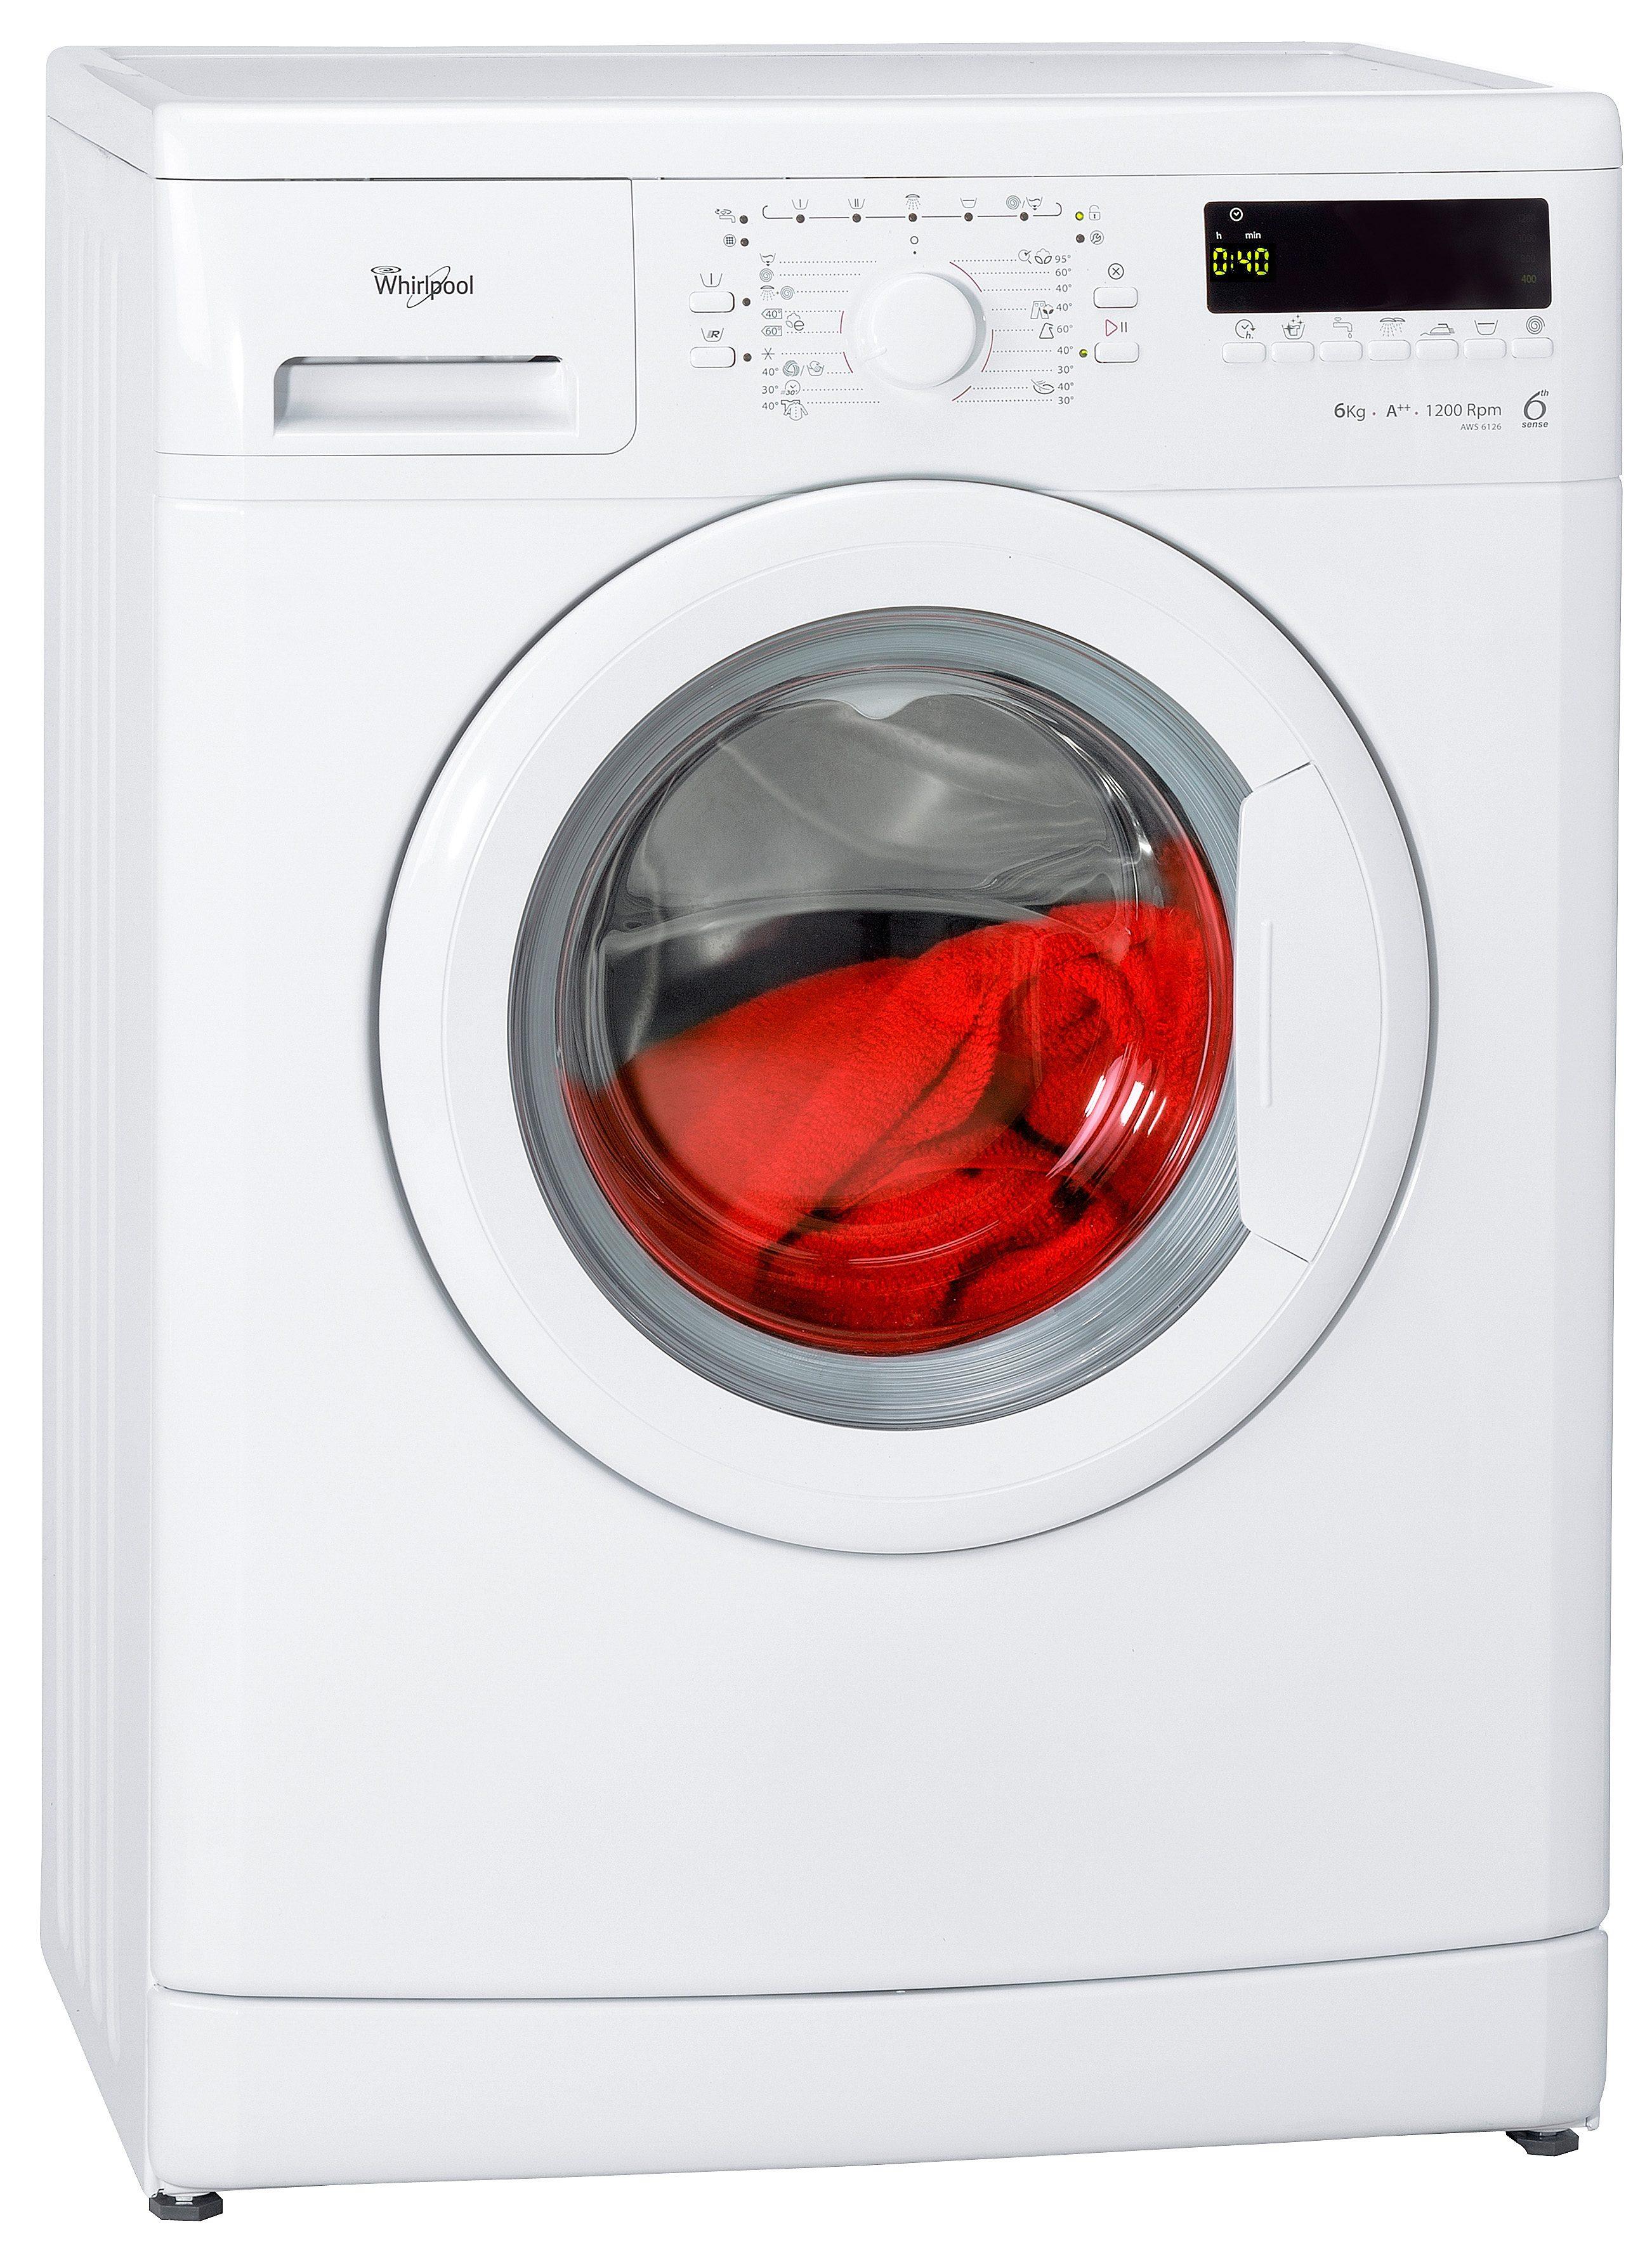 Whirlpool Waschmaschine AWS 6126, 6 kg, 1200 U/Min